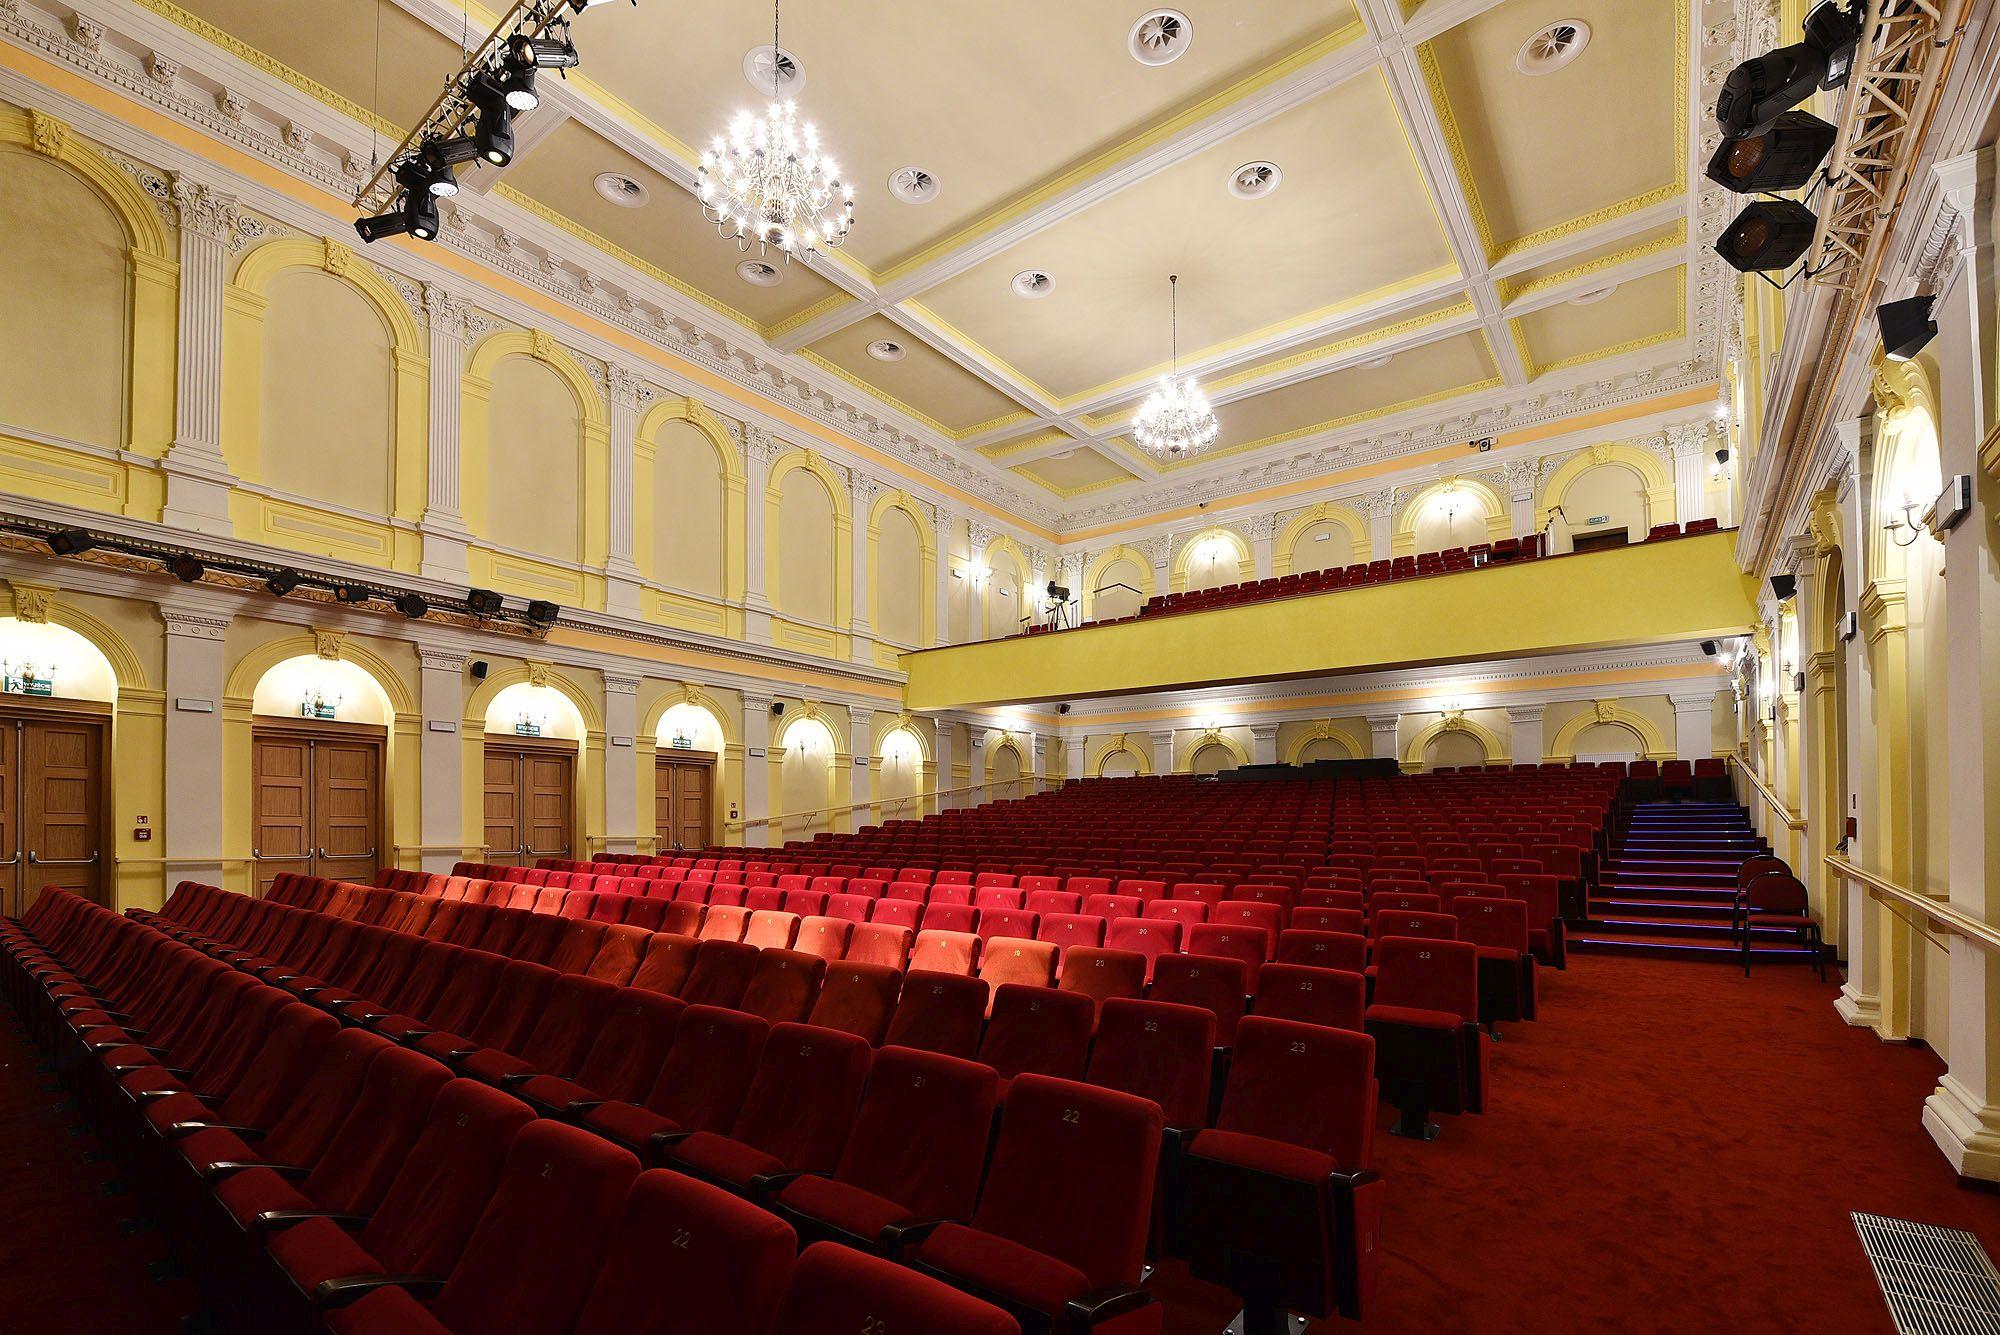 Bielskie Centrum Kultury po remoncie